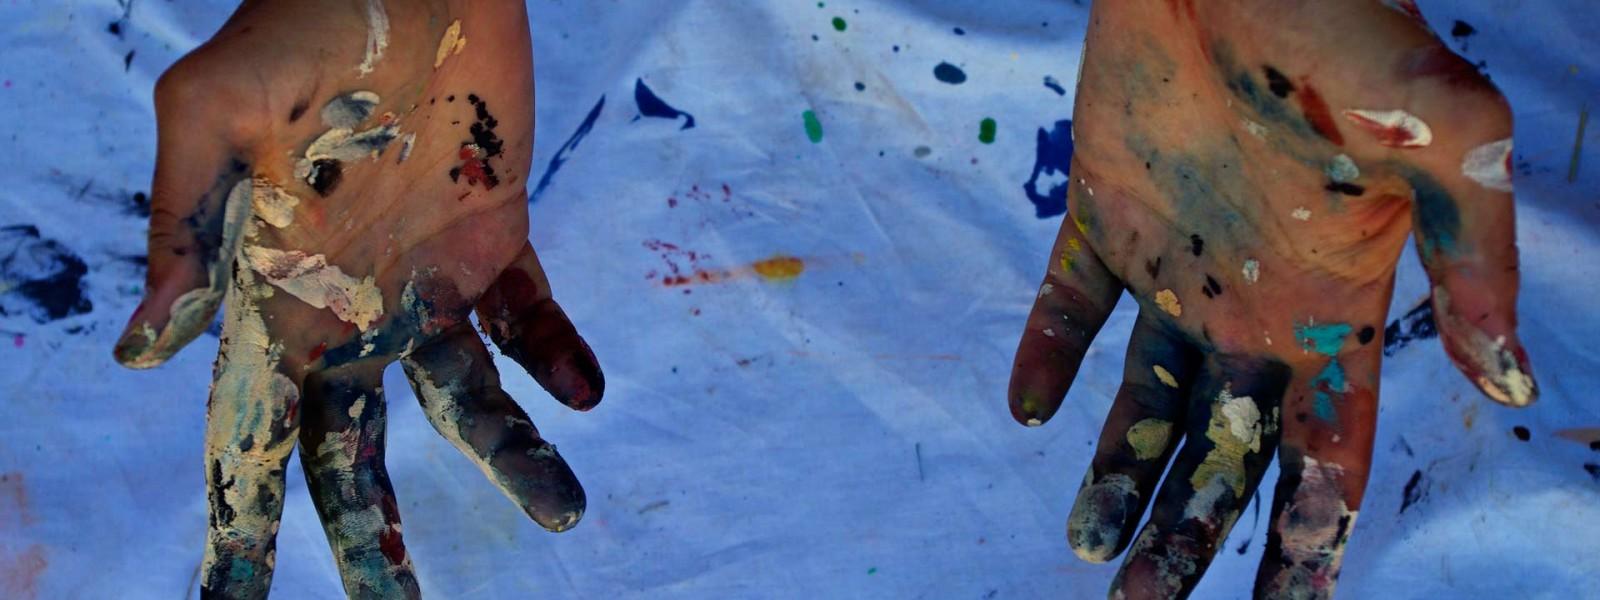 TRAVELLING ARTIST IN RESIDENCE -